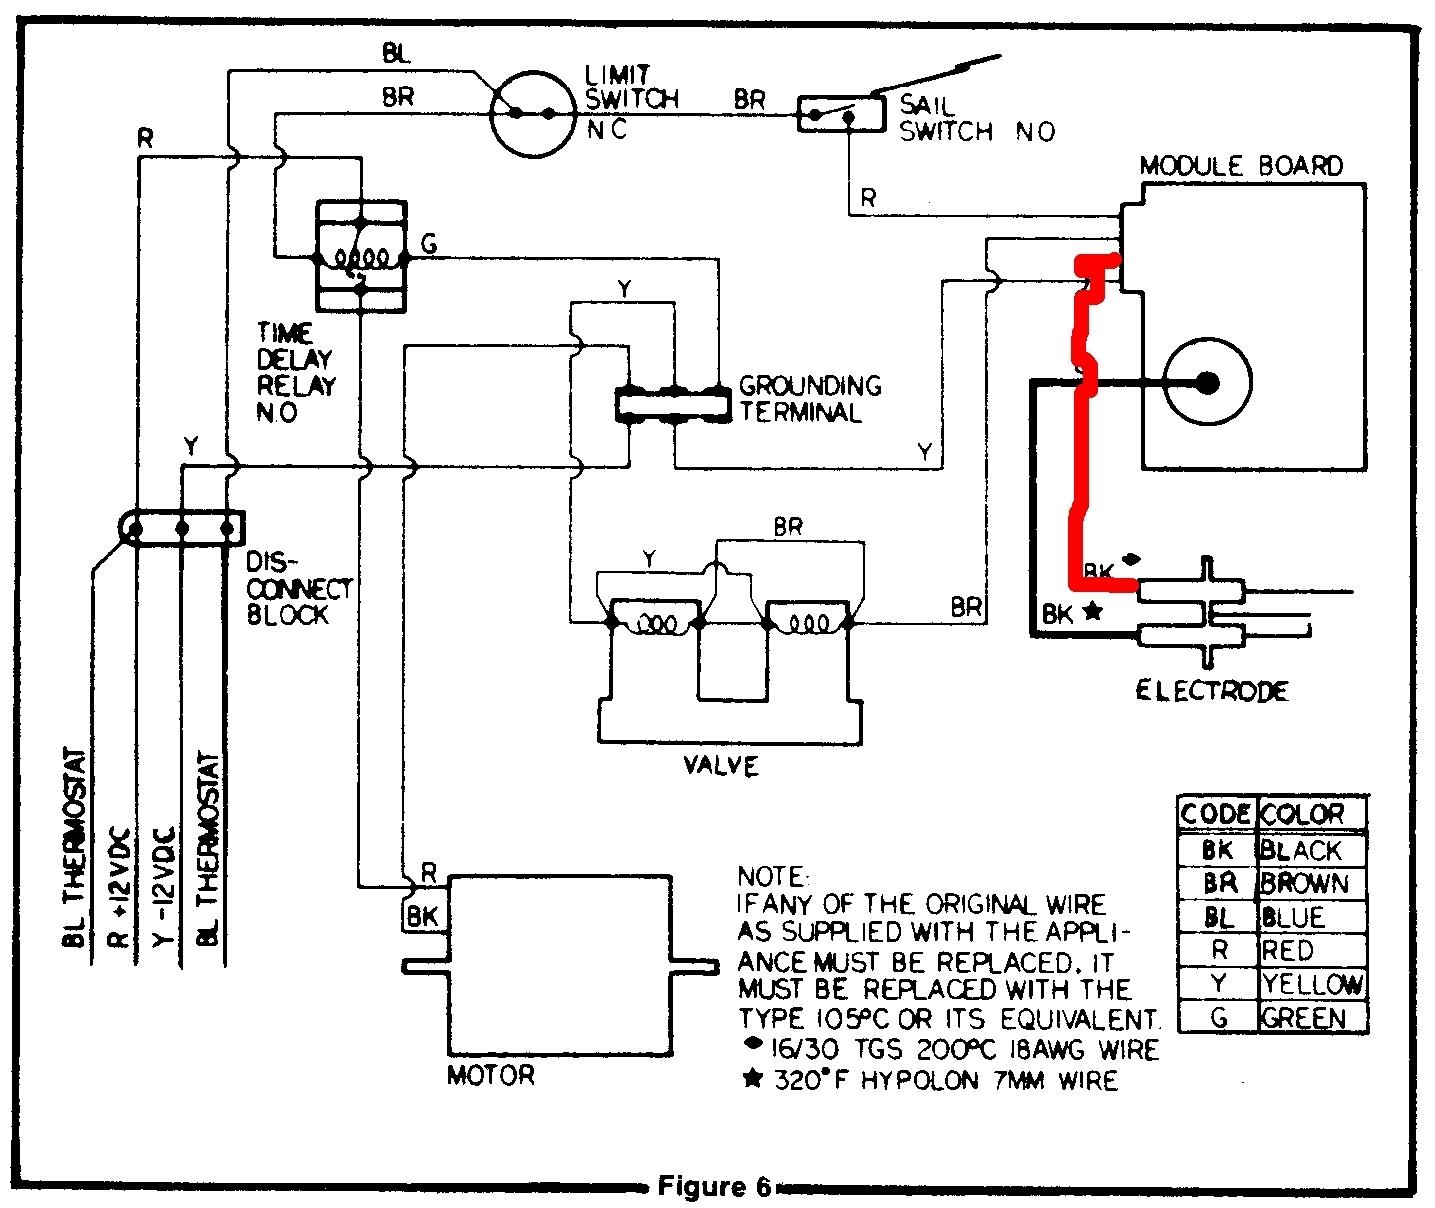 dometic ac thermostat wiring diagram sub wire fridge great installation of rm2652 schematic best secret u2022 rh anutechnologies co rv